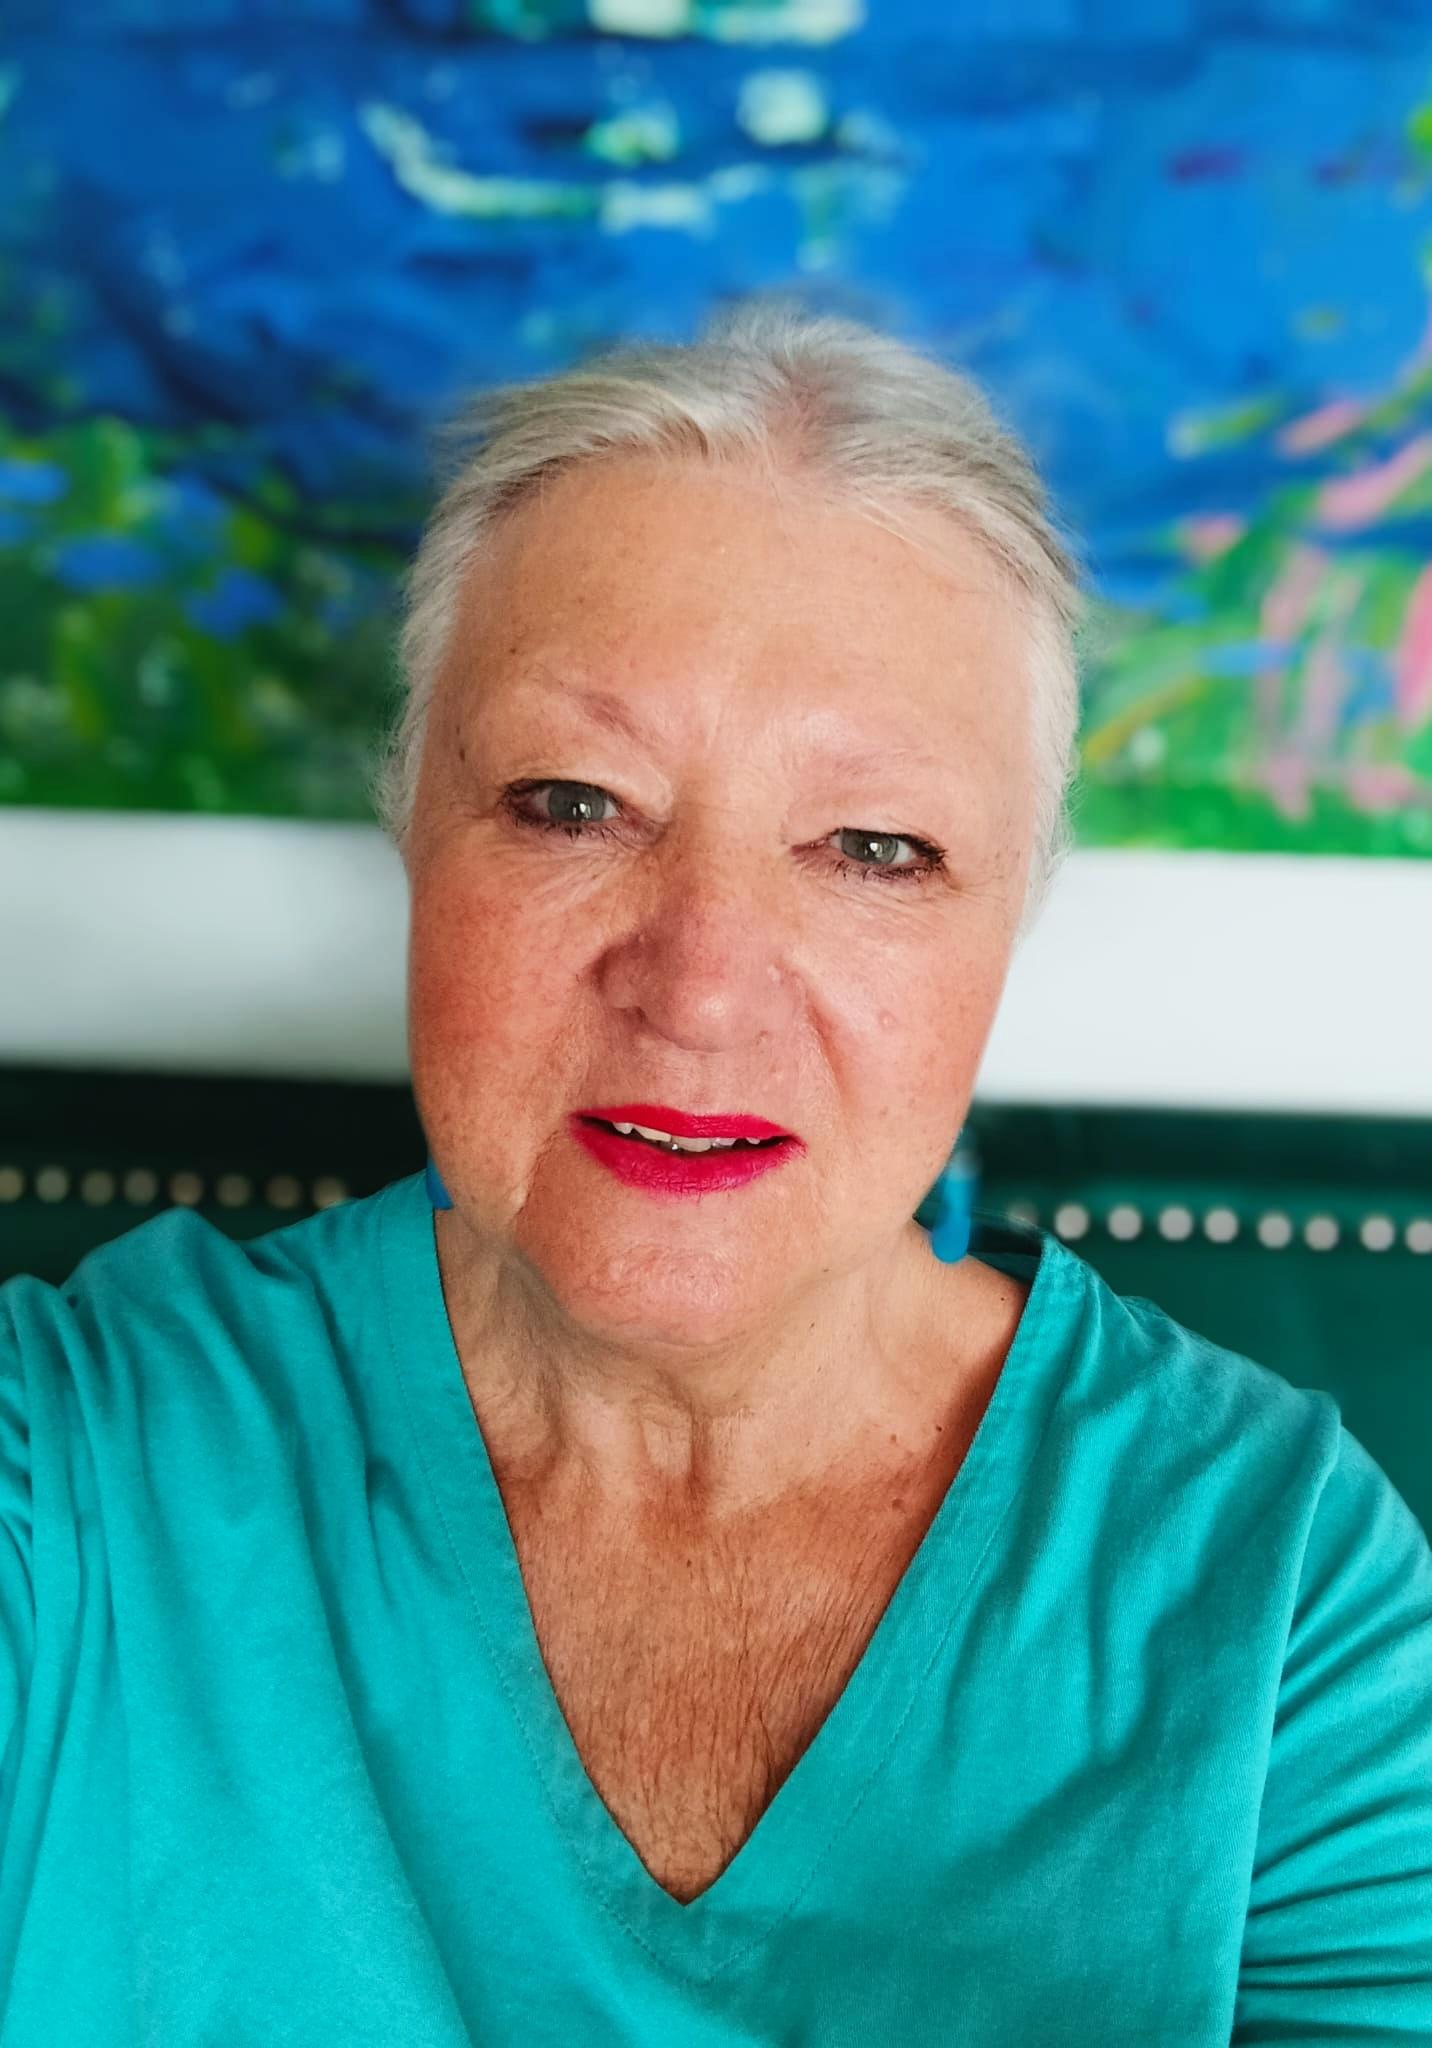 Gisela Leiter - Kinesiologin, Coach & Yogische Heilerin